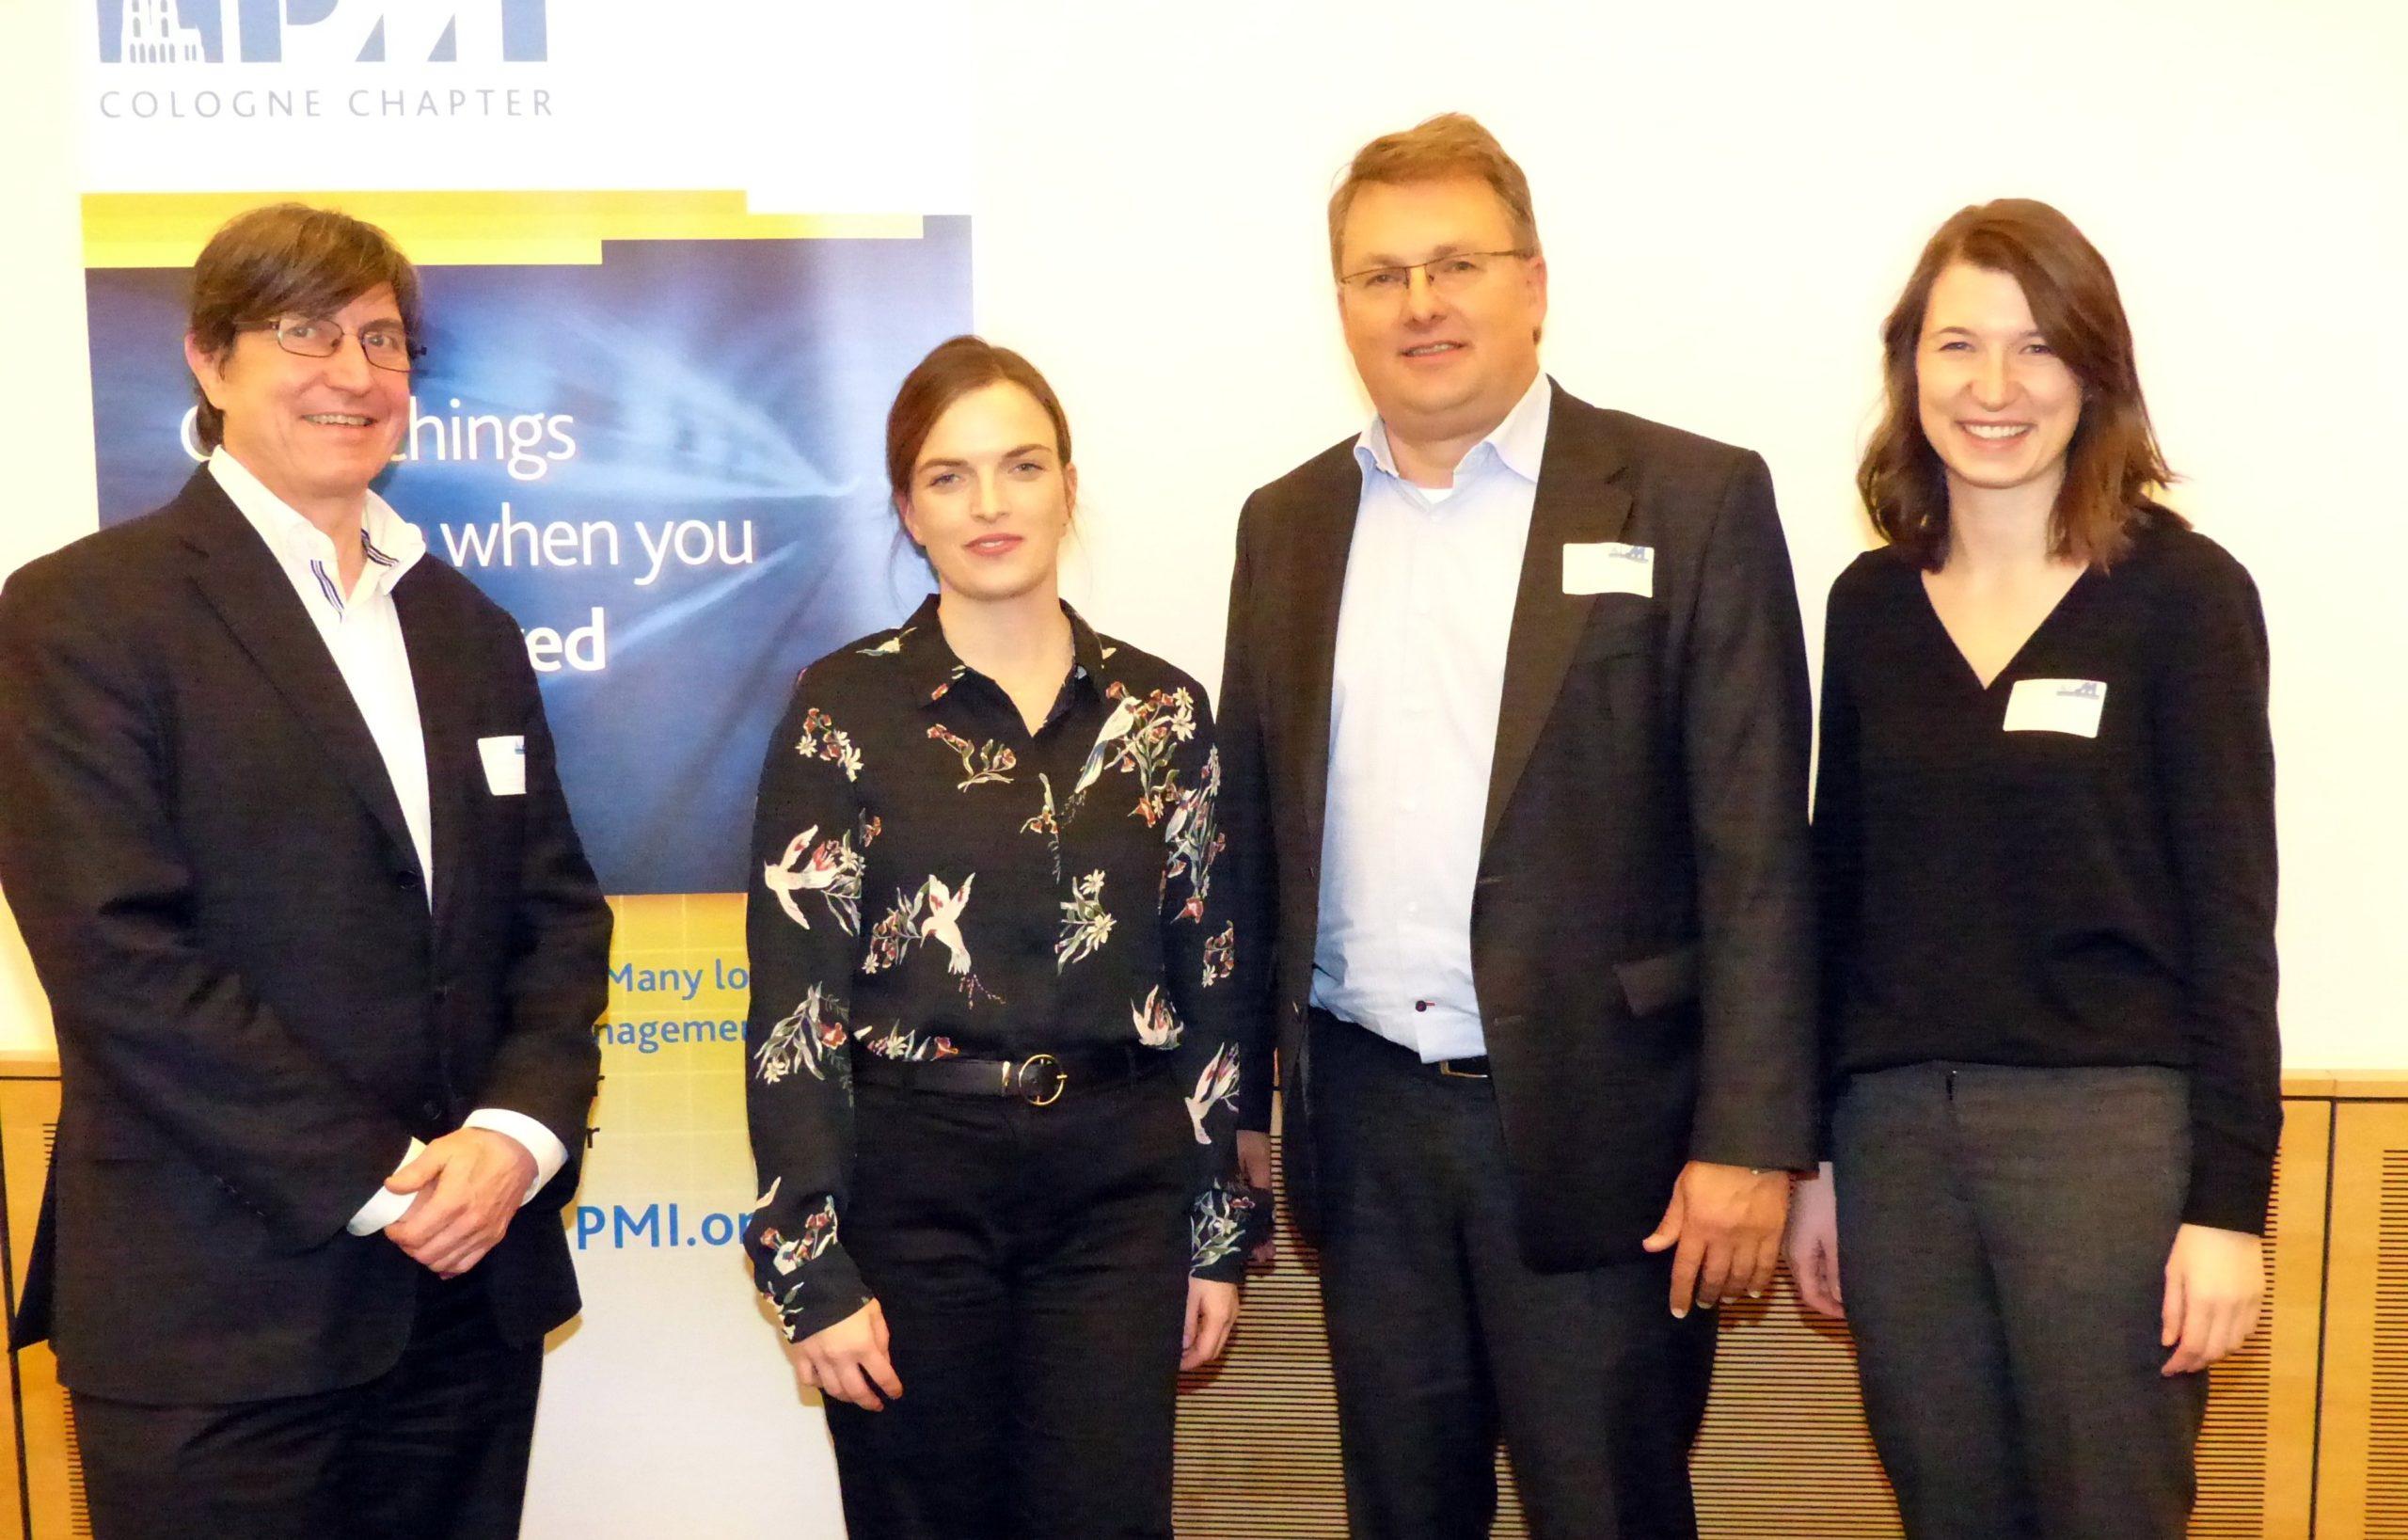 Dr. Peter Fey, Frau Patricia Zipperling, Prof. Ayelt Komus, Frau Sonja Schmidt